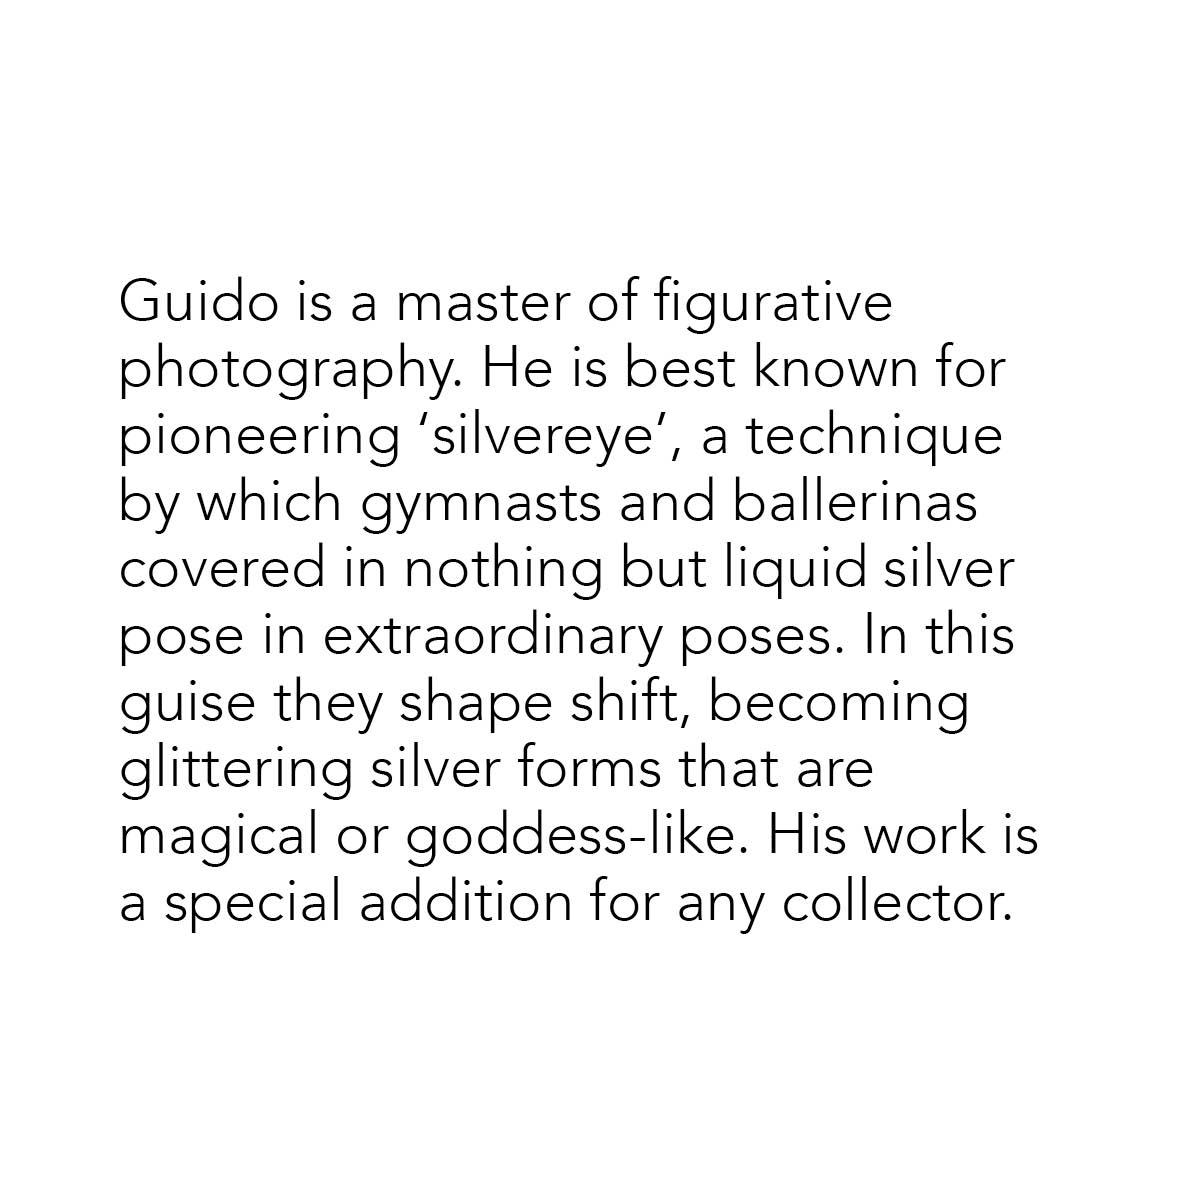 09_ArtistText_Guido